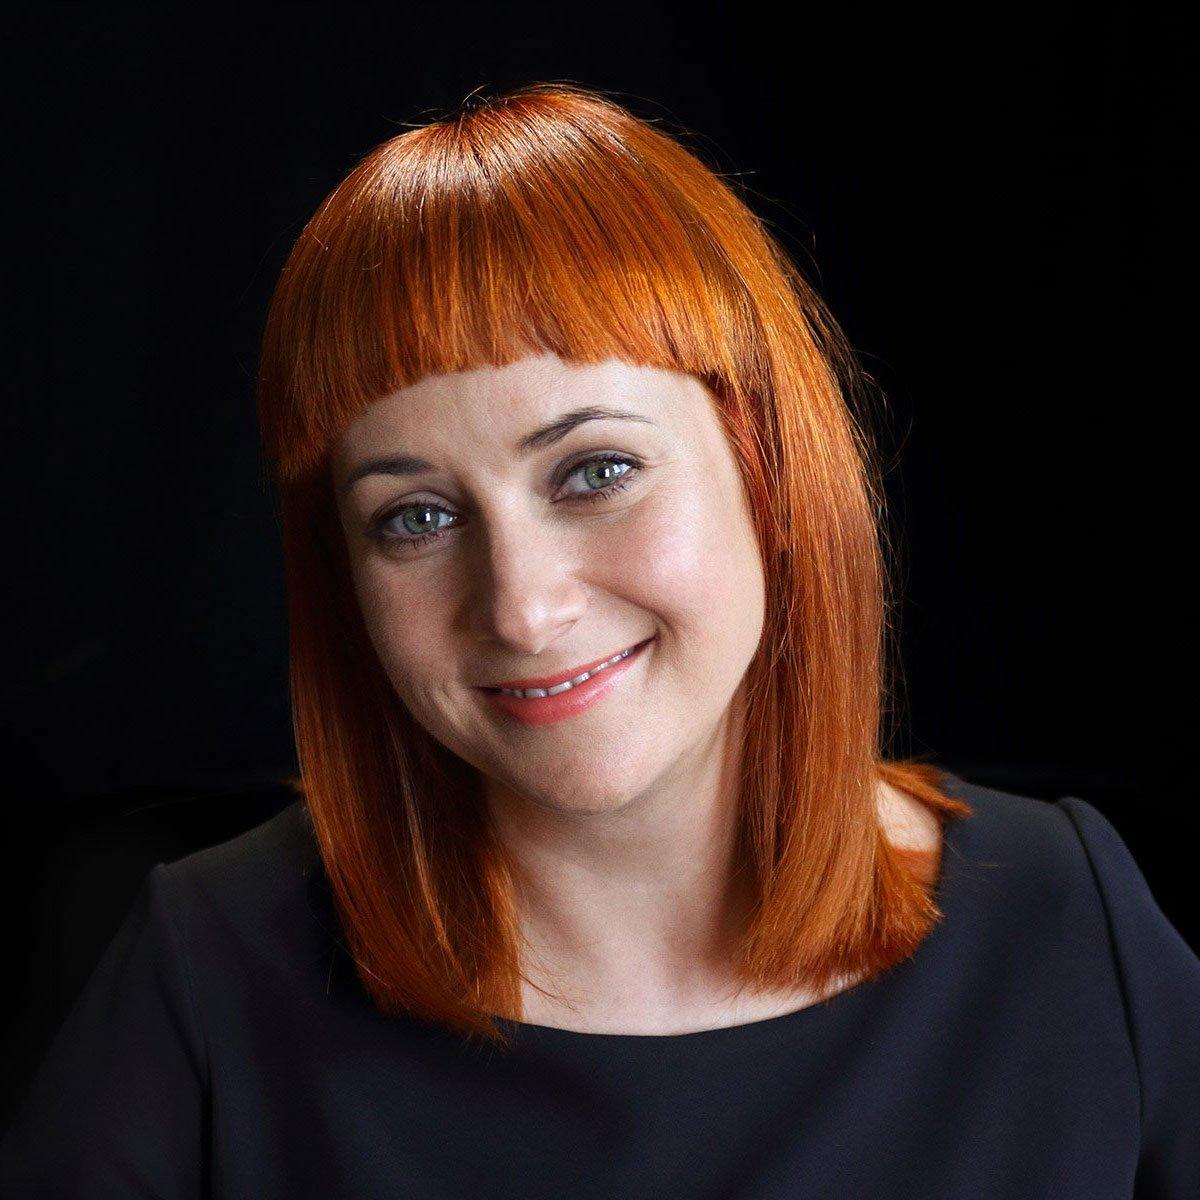 Image of Dominika Sieradzka